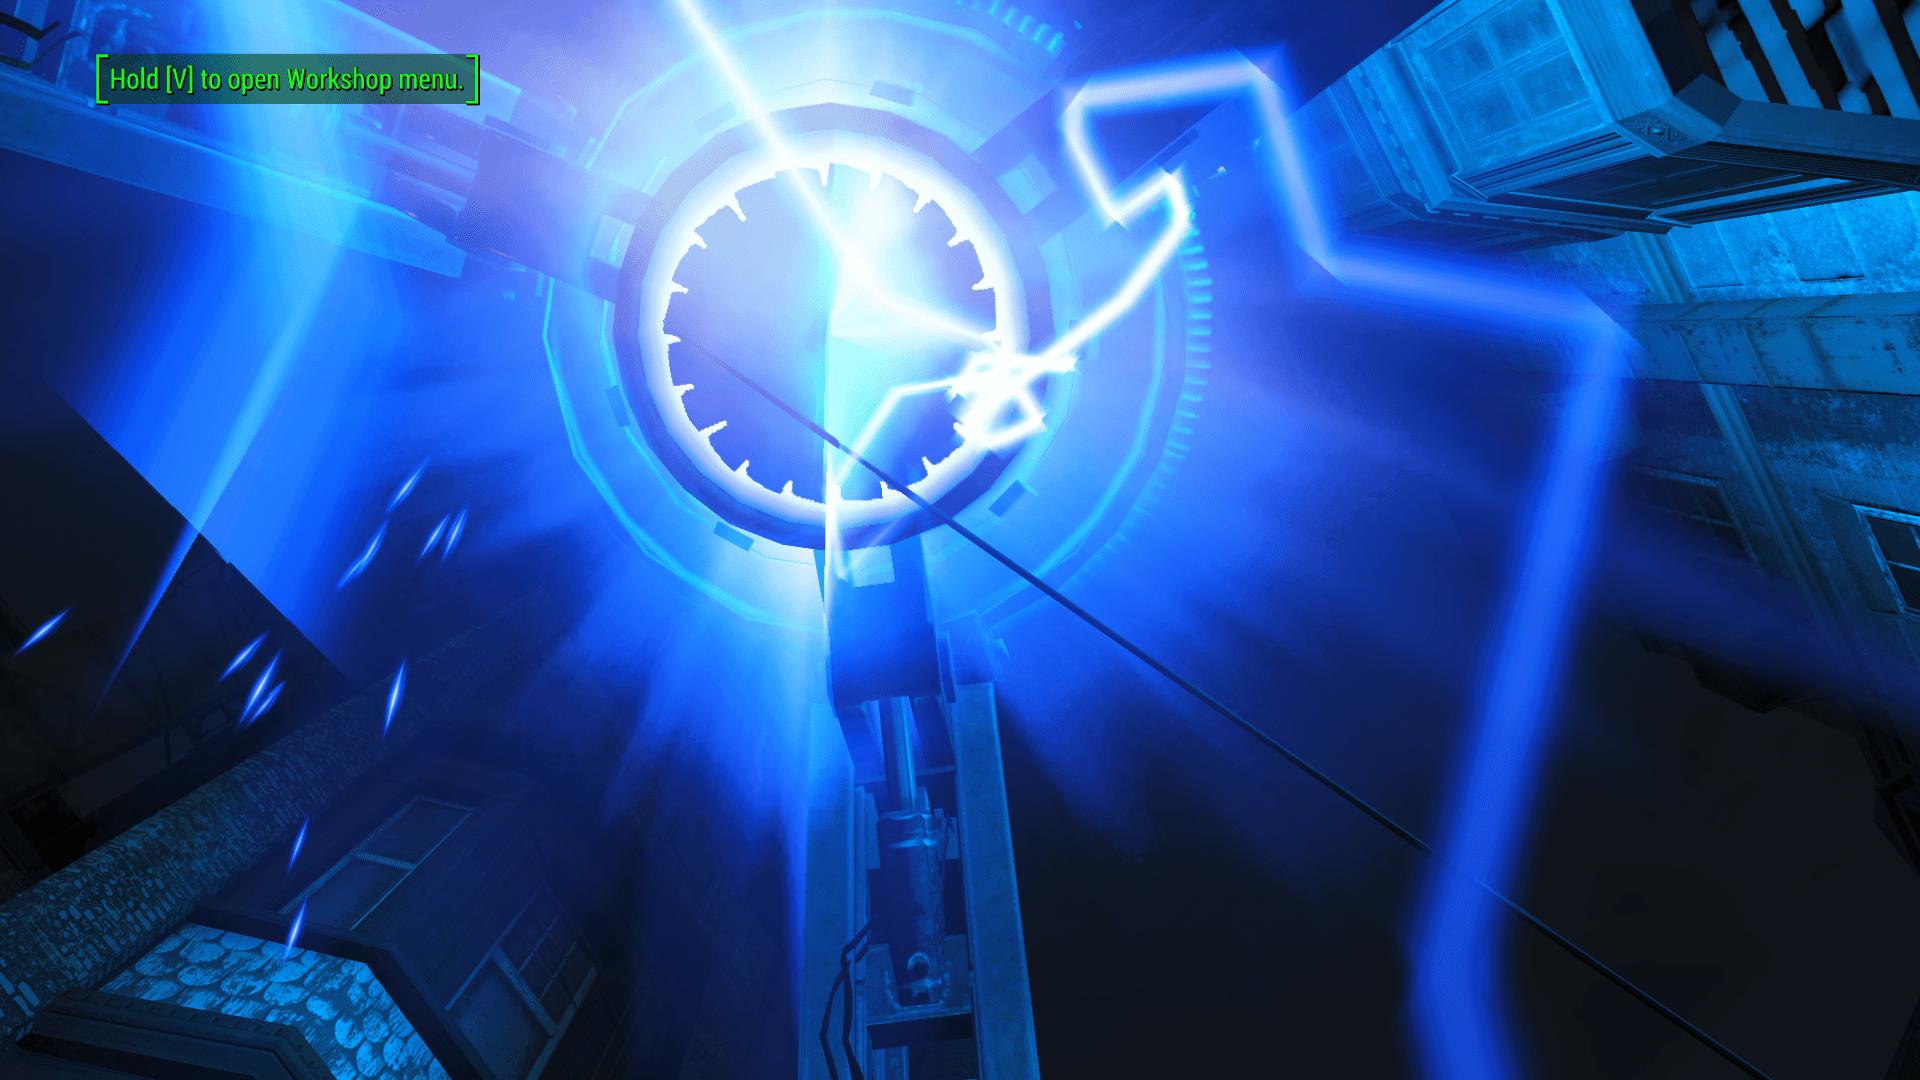 Fallout4Launcher 2015-12-30 17-31-25-37